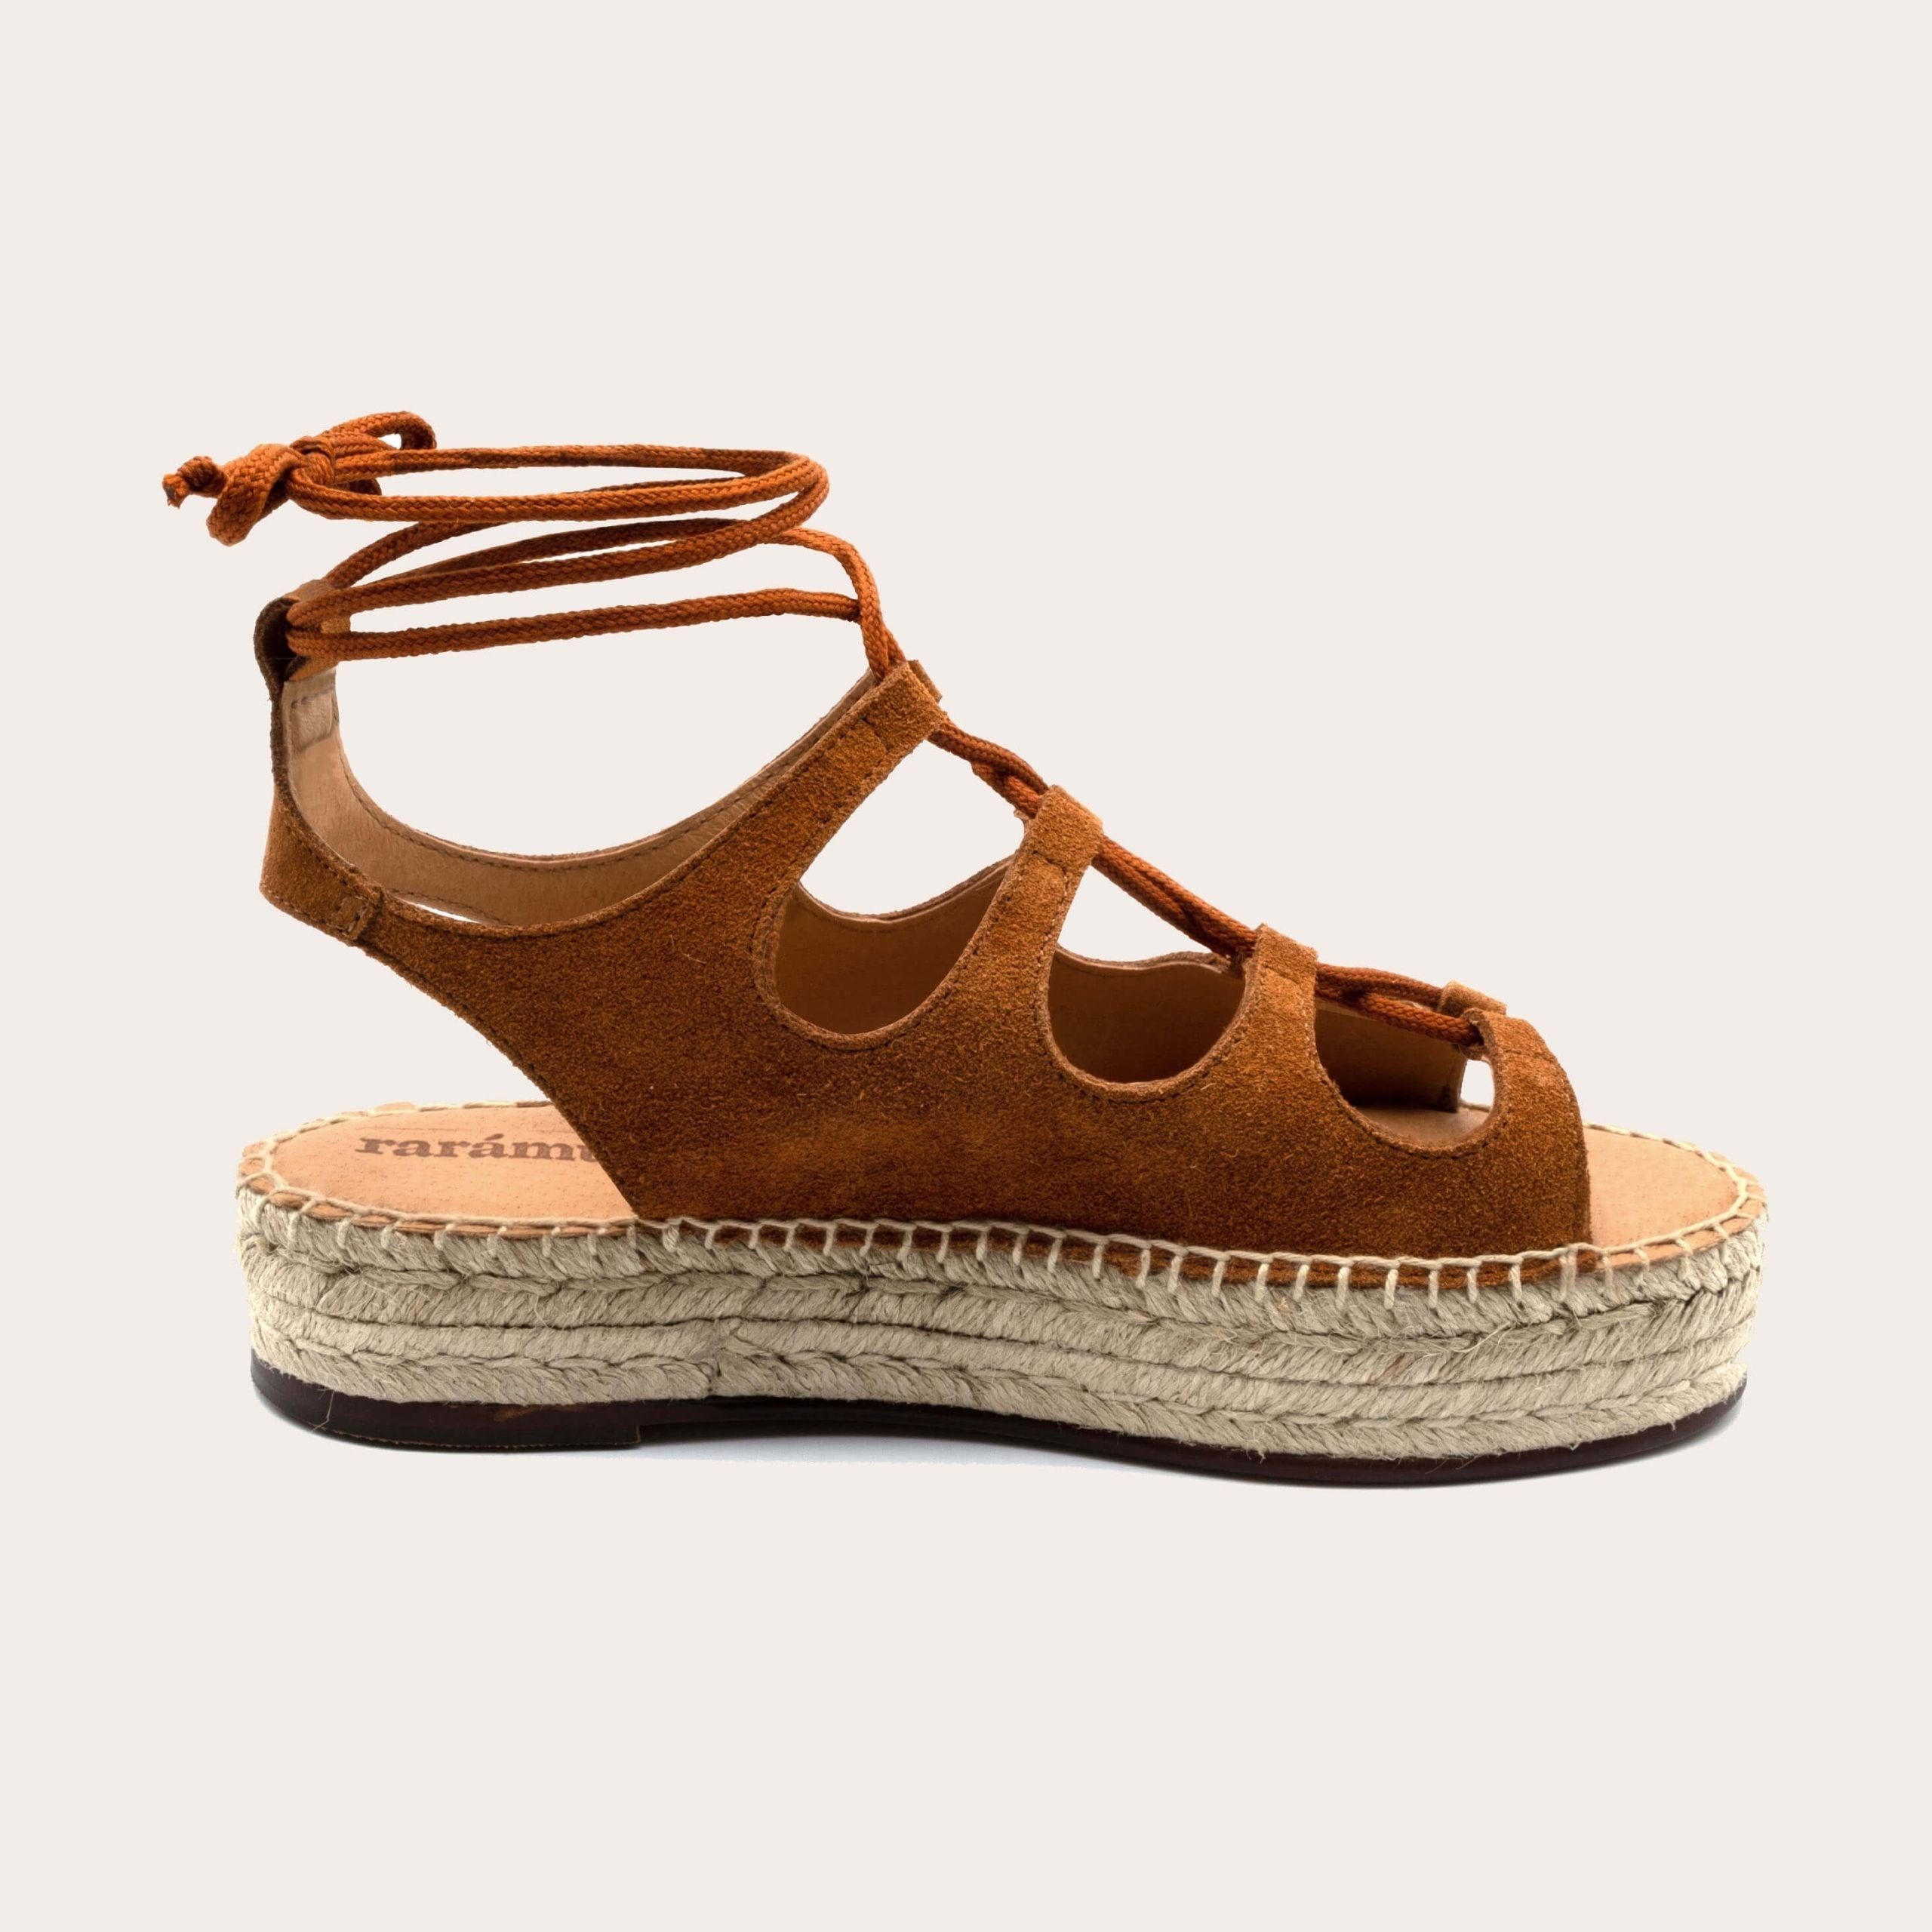 rafa-brown_1_lintsandalen sandals travelsandals vegan sustainable sandals wikkelsandalen